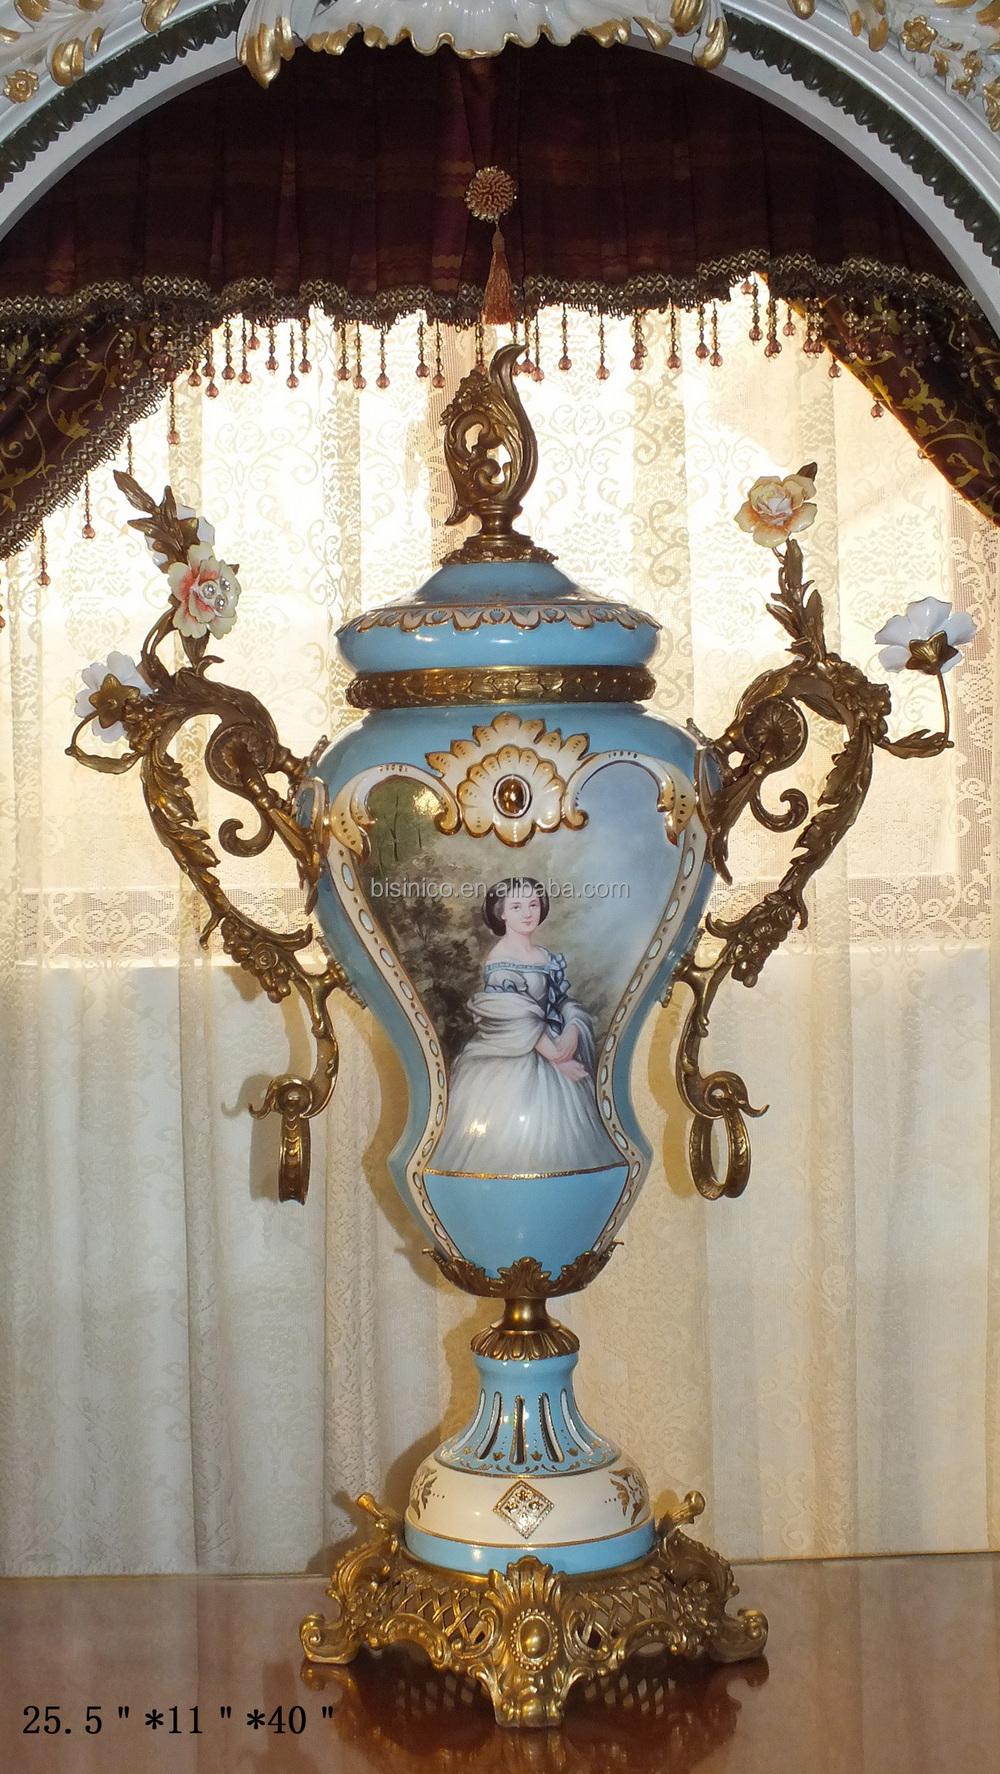 Franse barok antiek porselein huisdecoratie/luxe porseleinen ...